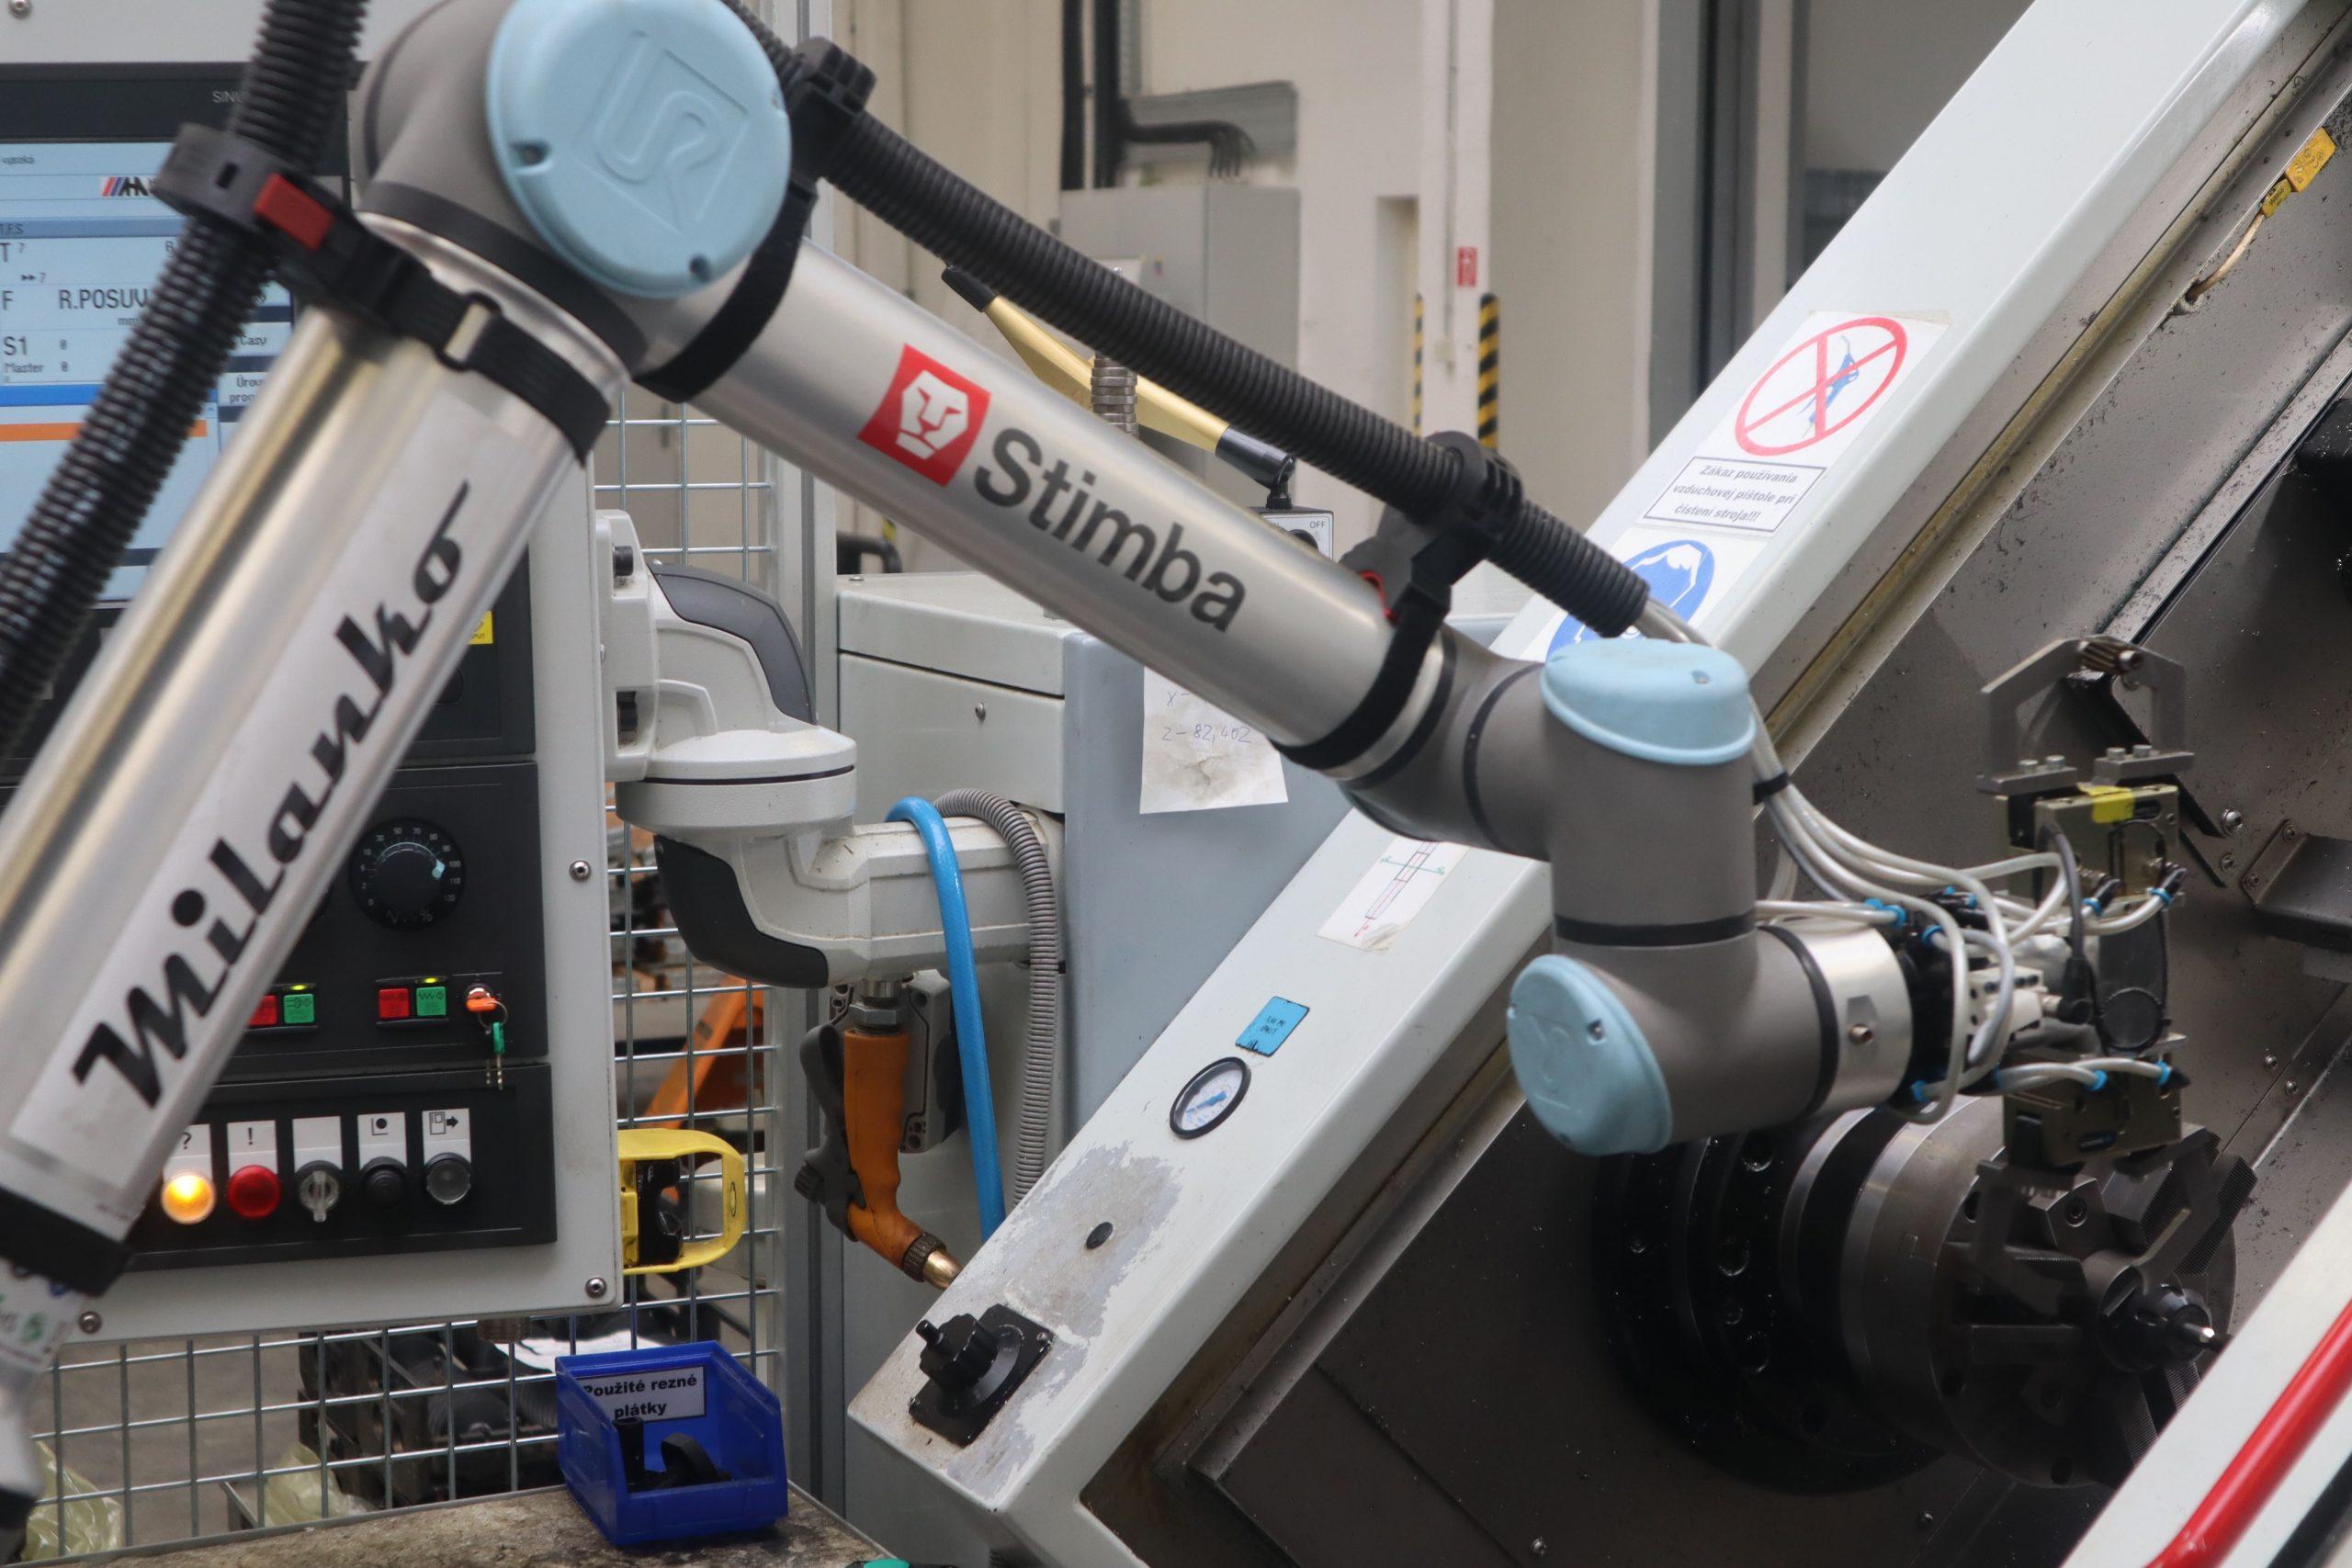 Bauer | obsluha CNC | zakladanie ozubených kolies a pastorkov s UR10e